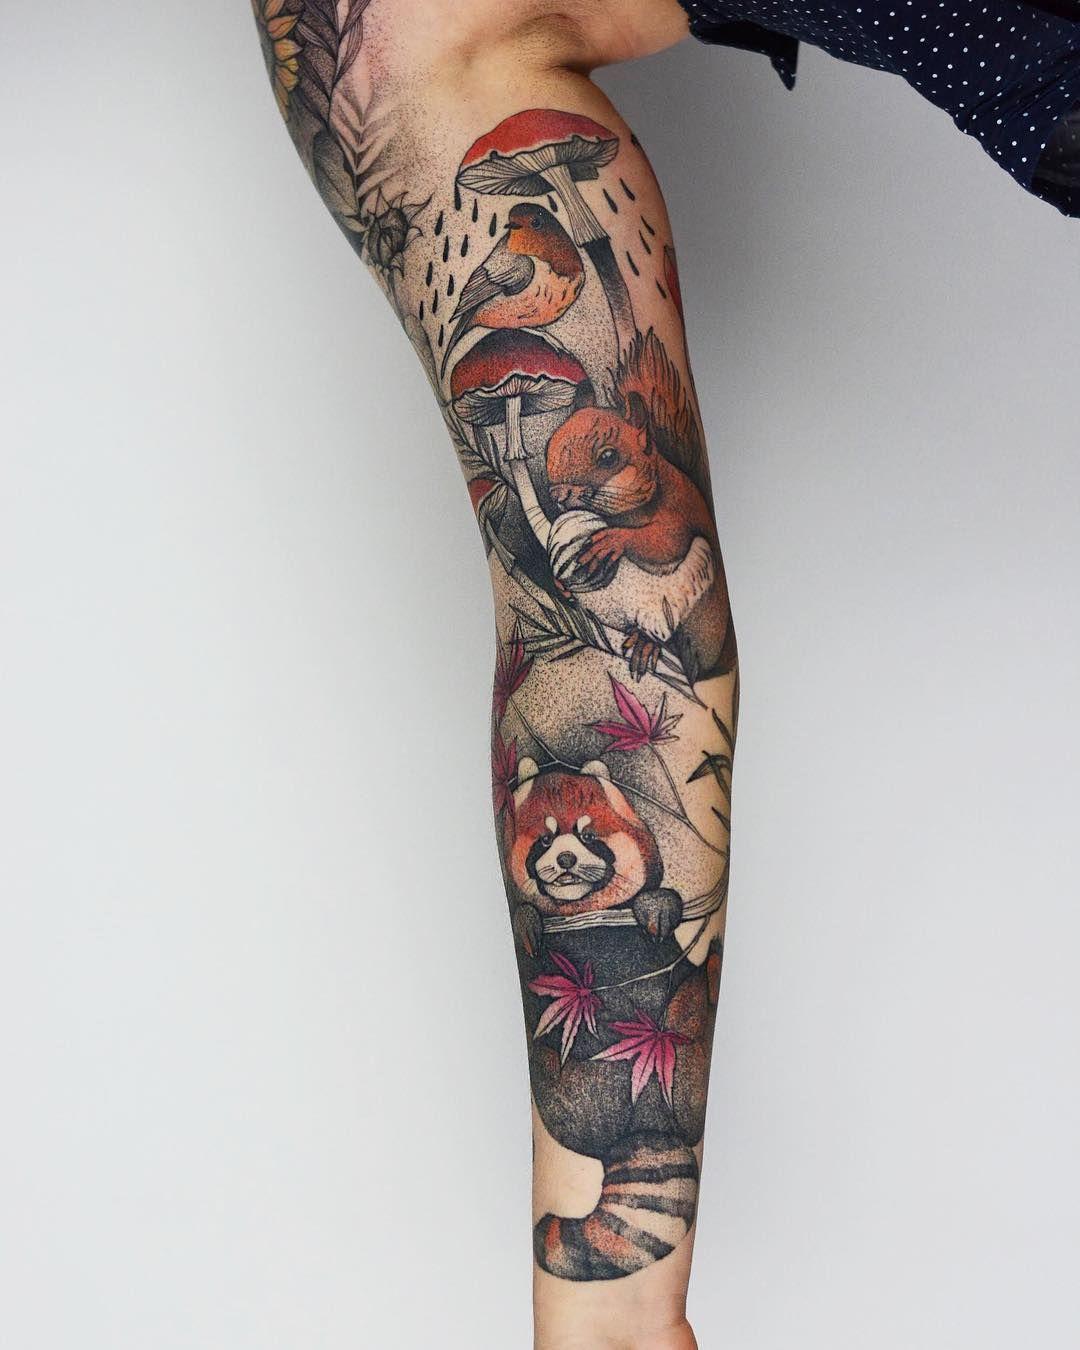 Dzo Lama S Fairy Tattoos Fairy Tattoo Fairy Sleeve Tattoo Sleeve Tattoos For Women